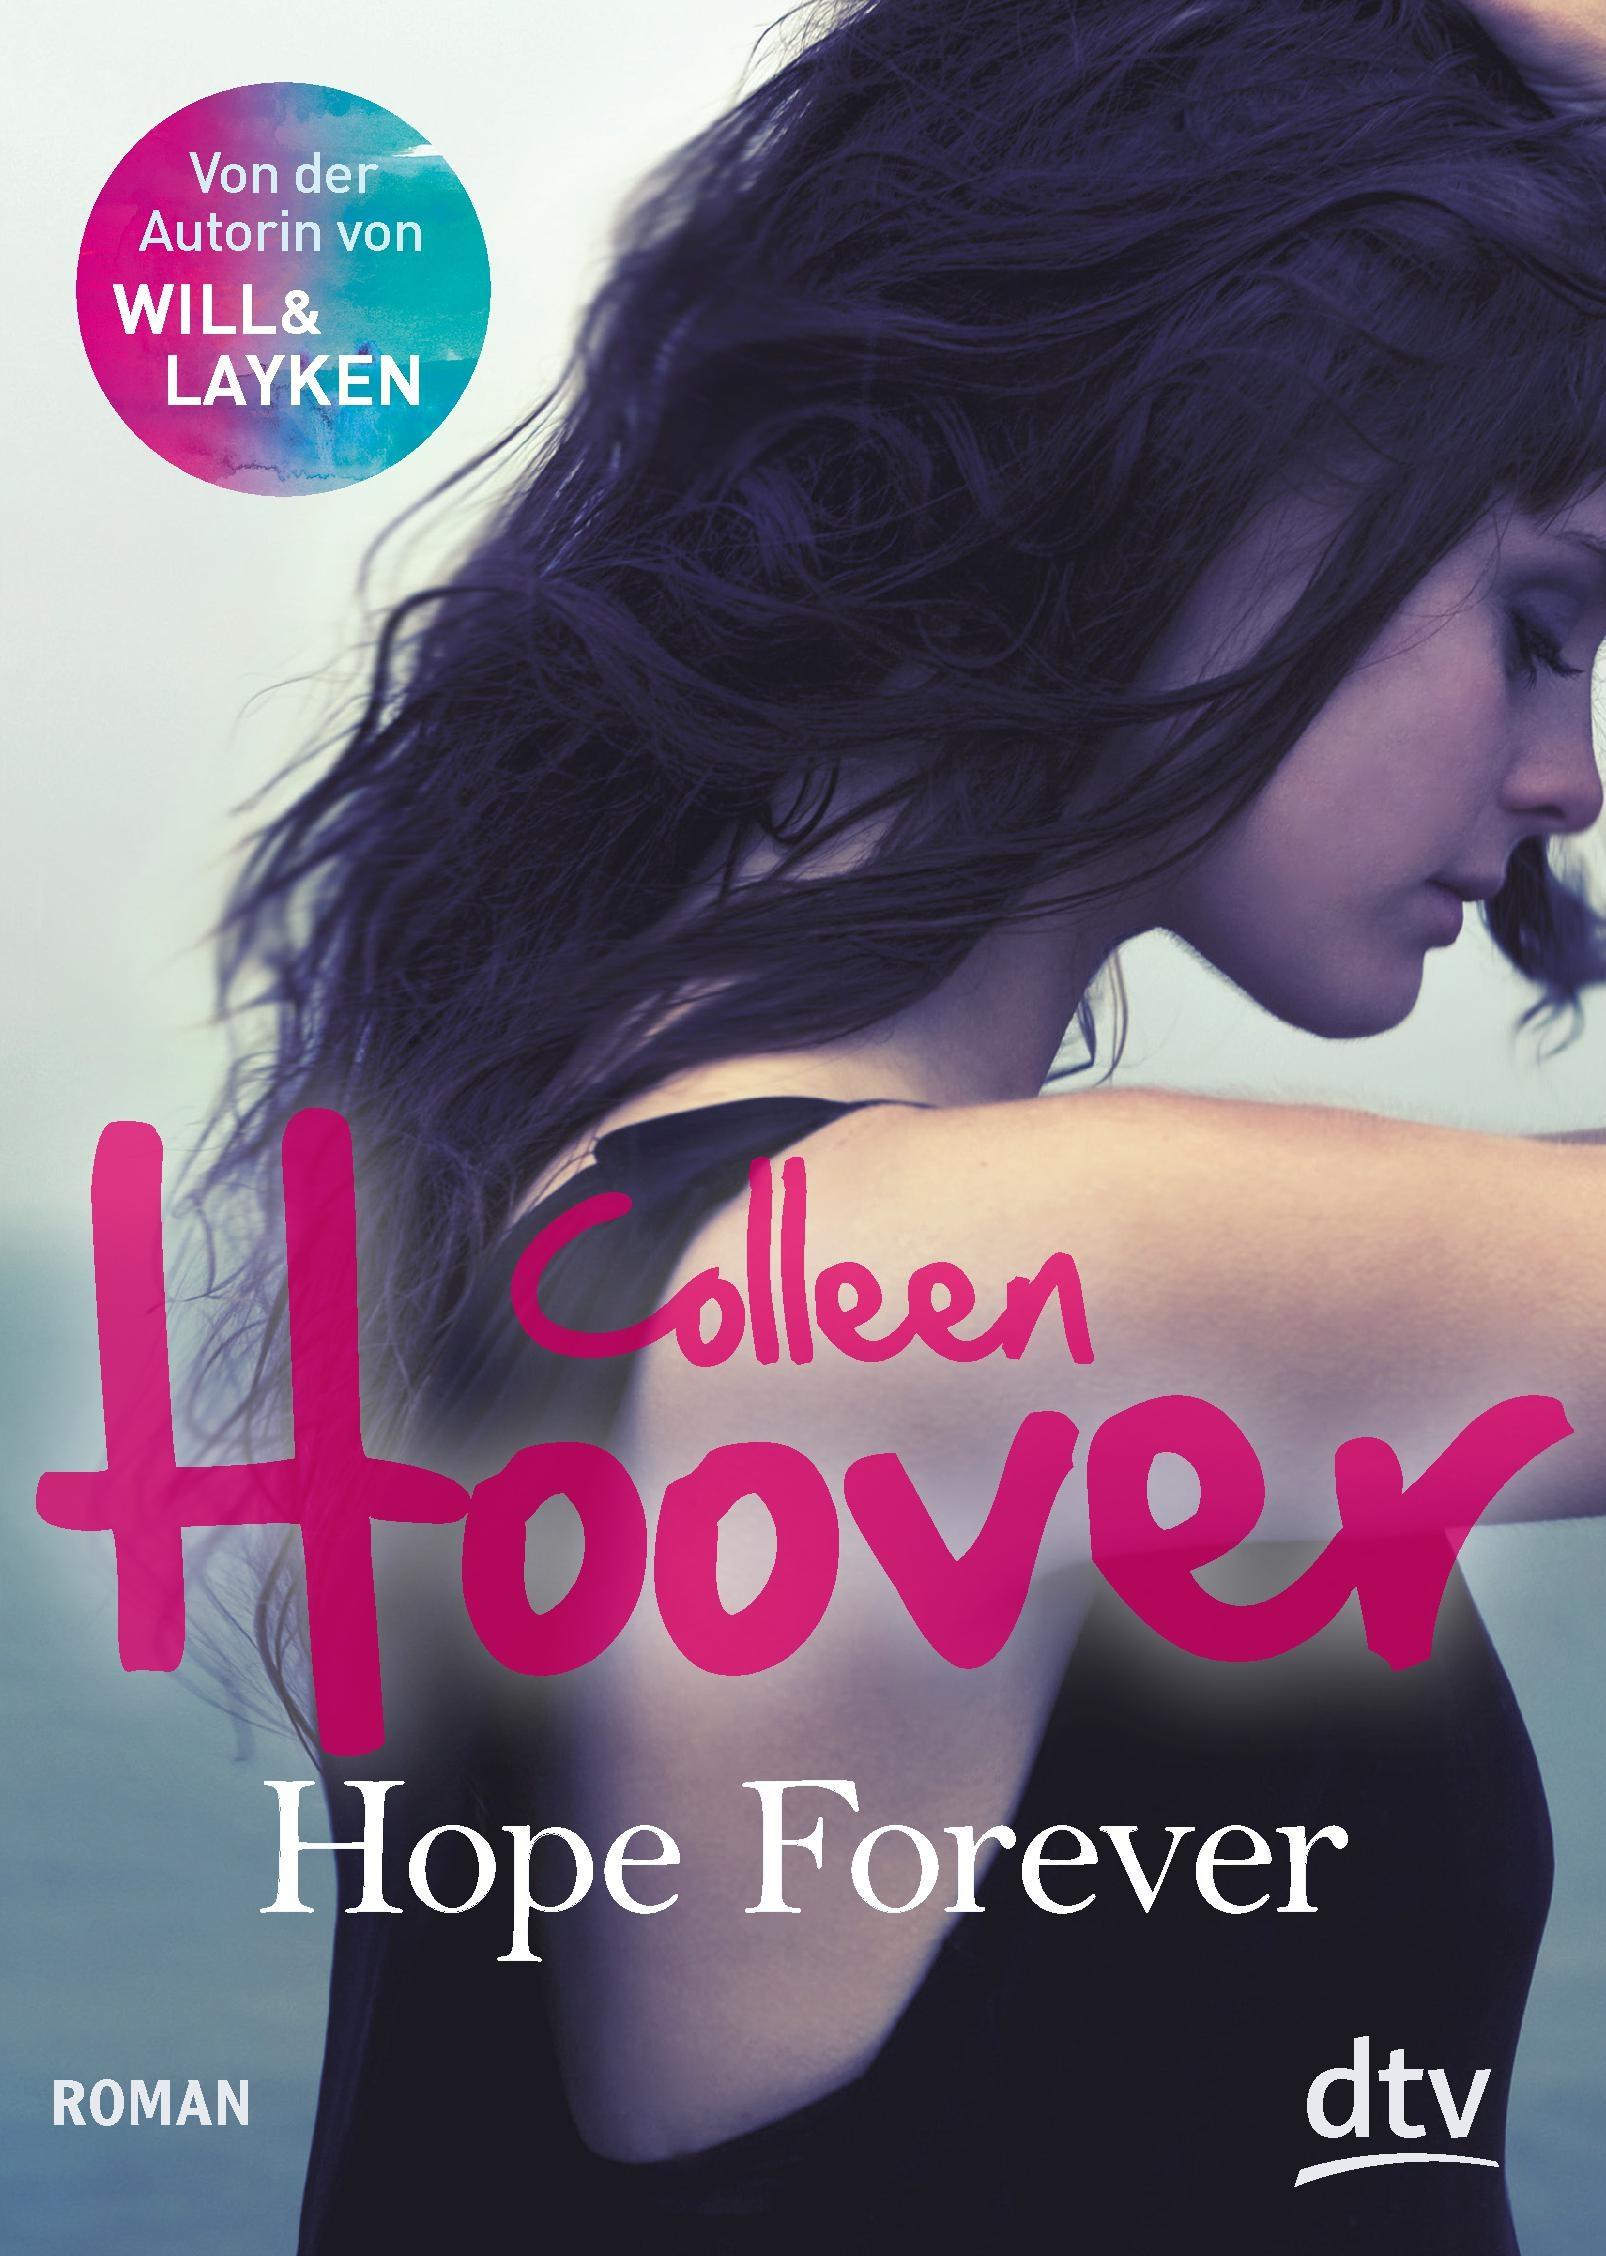 Hope Forever - Colleen Hoover [Taschenbuch]